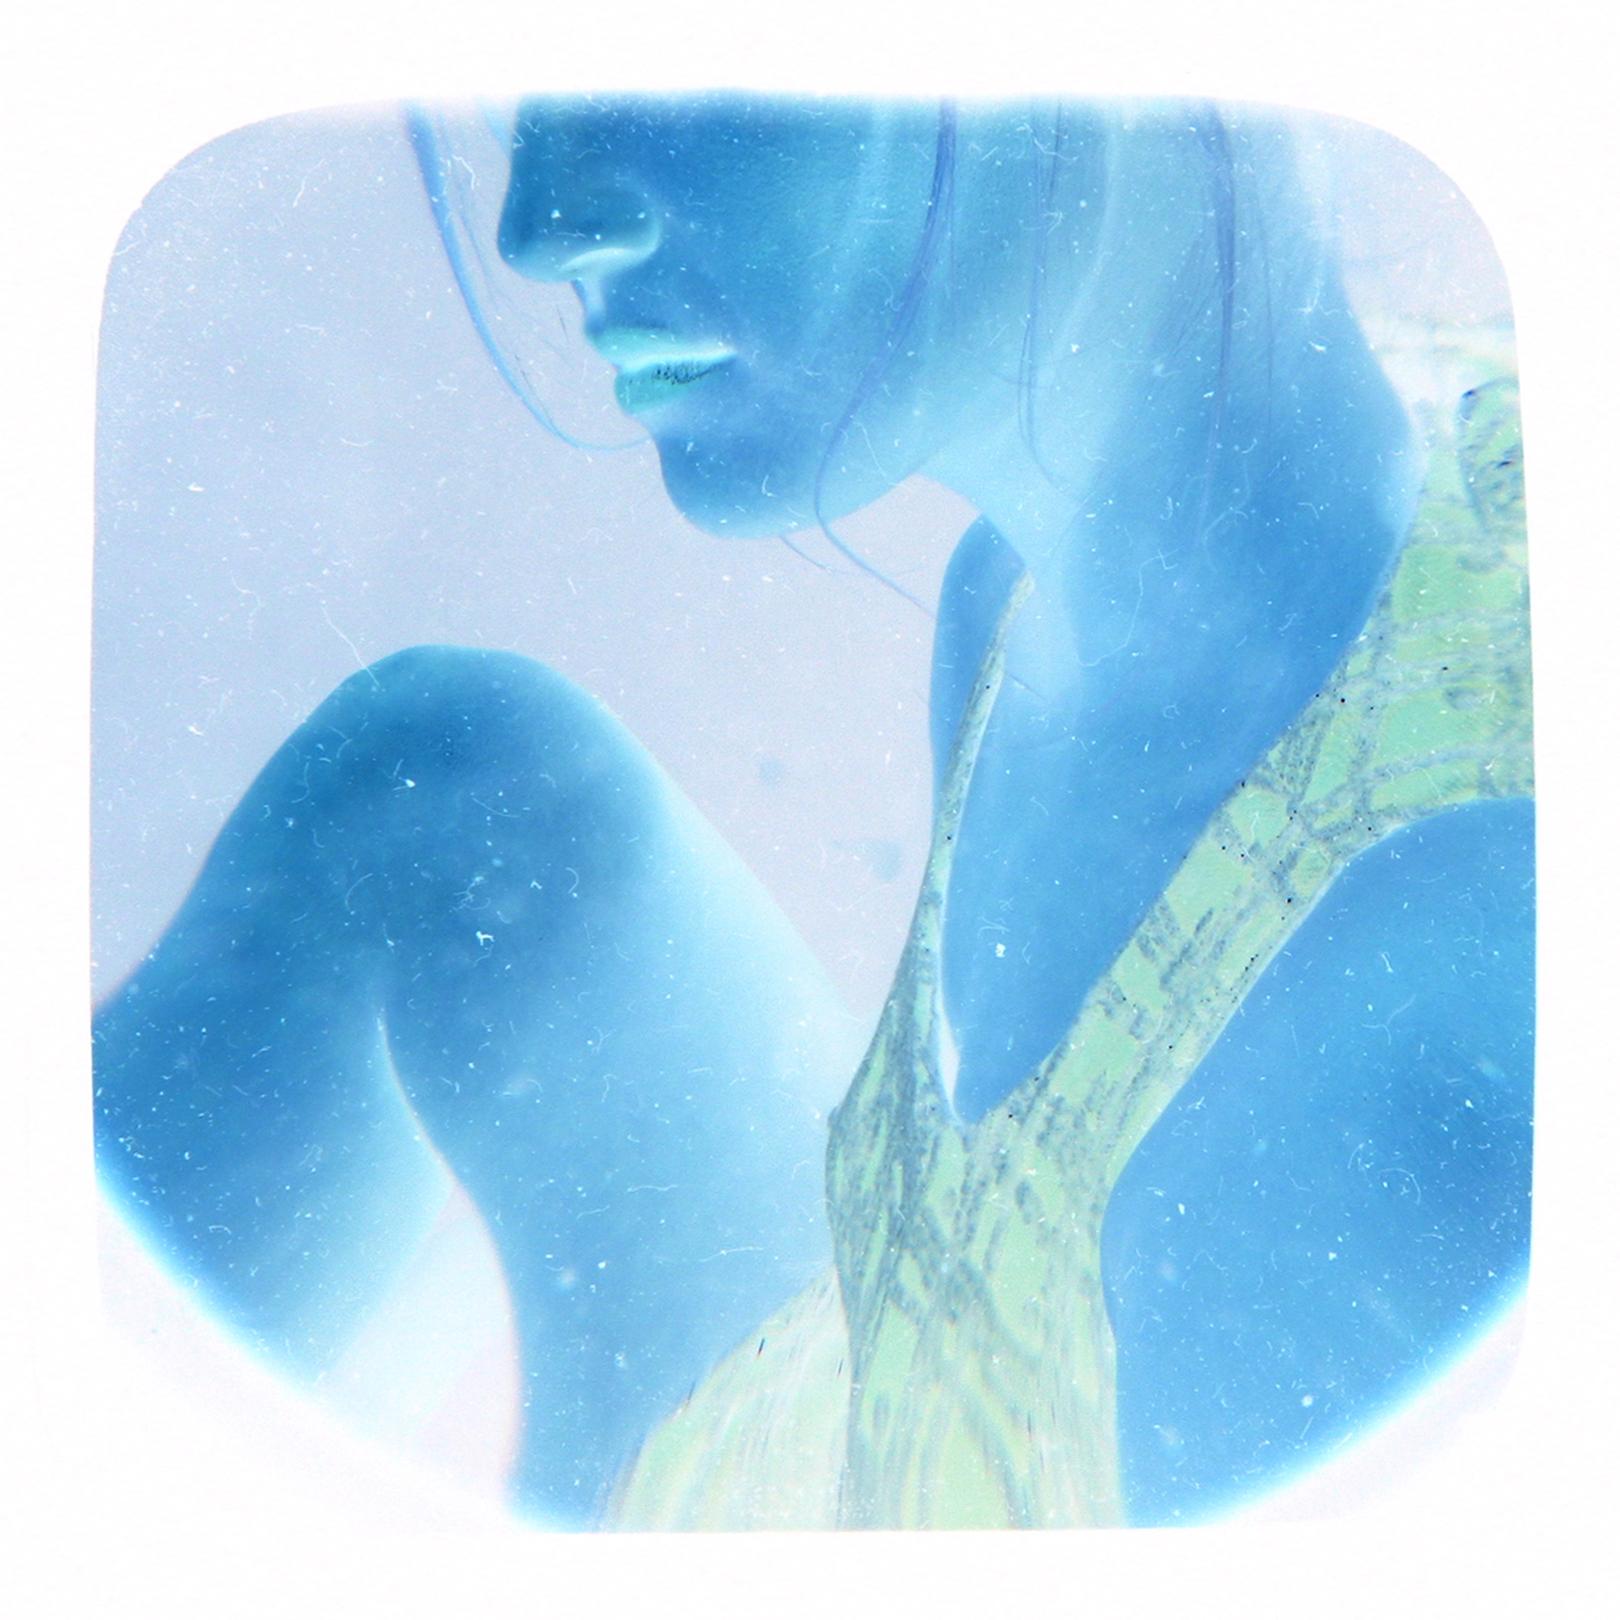 BLUE PRINT 8.jpg